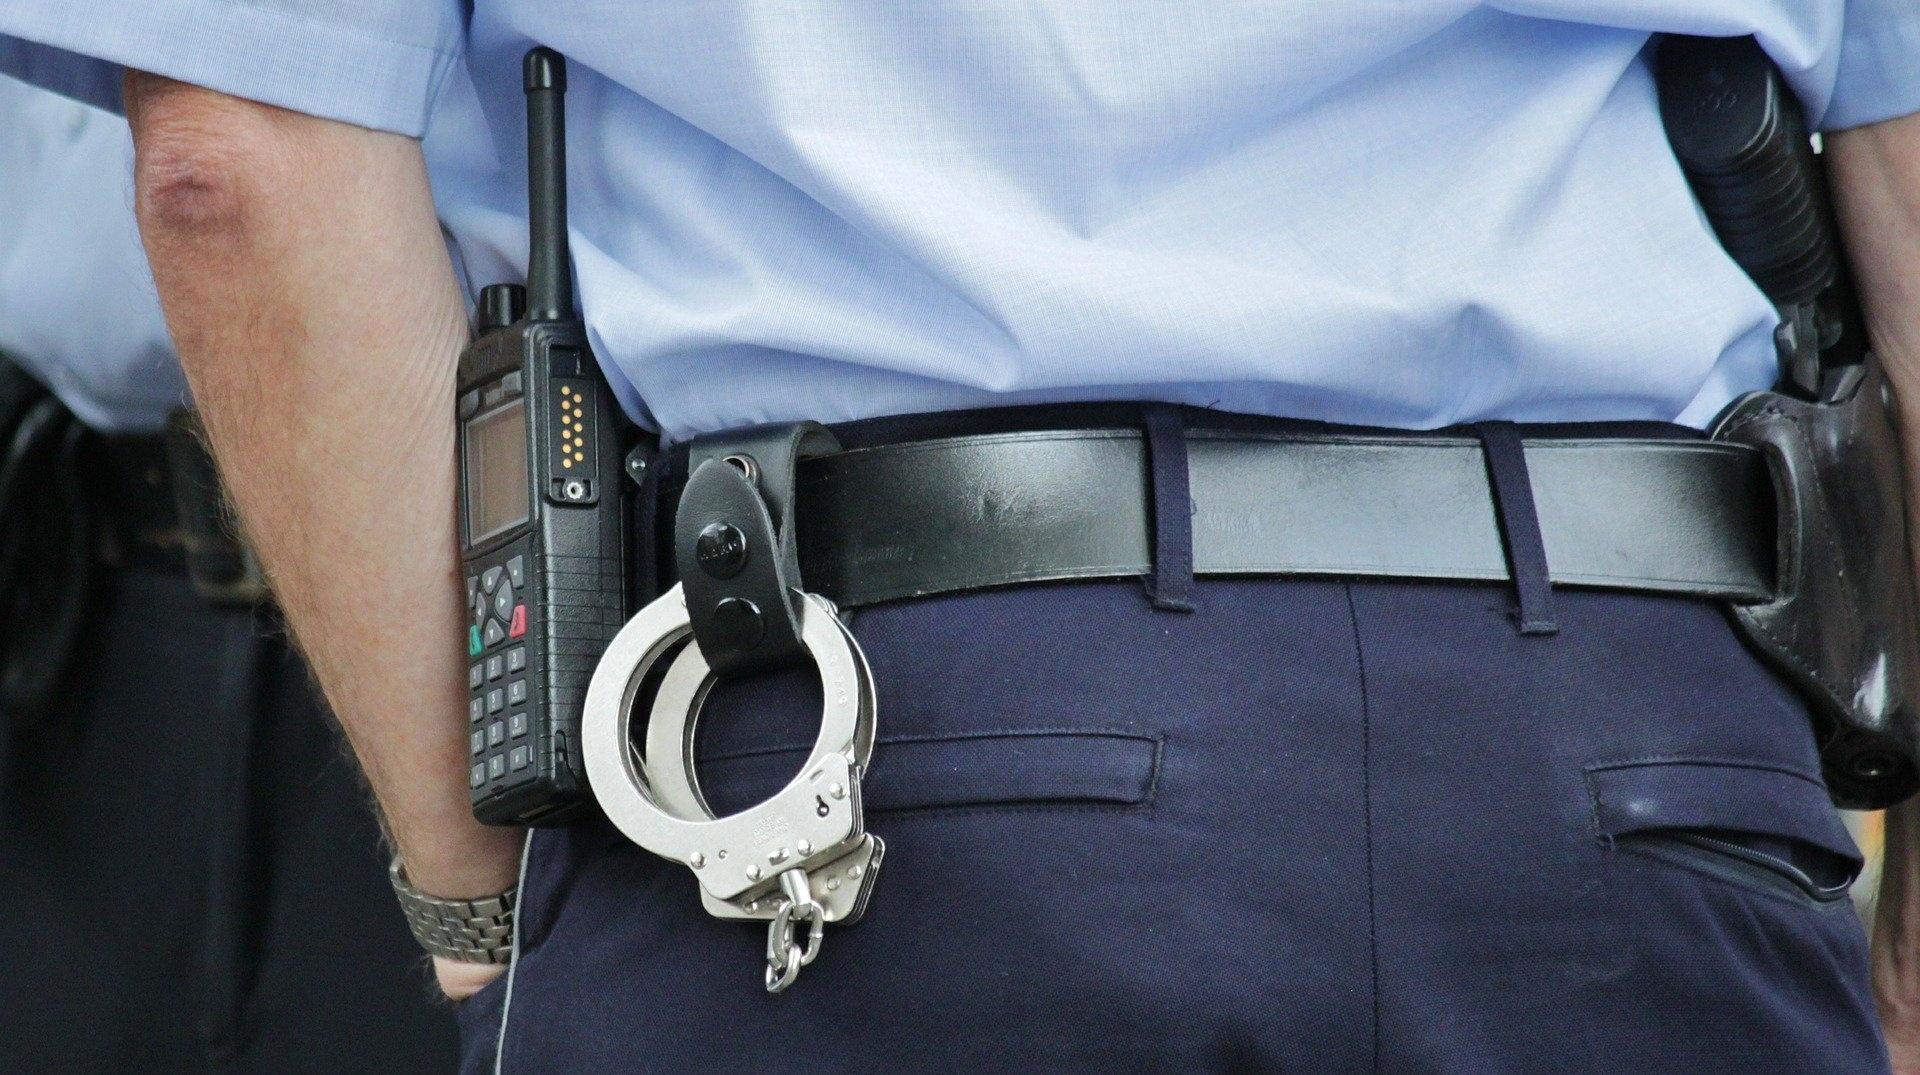 police-378255_1920-267653-edited.jpg